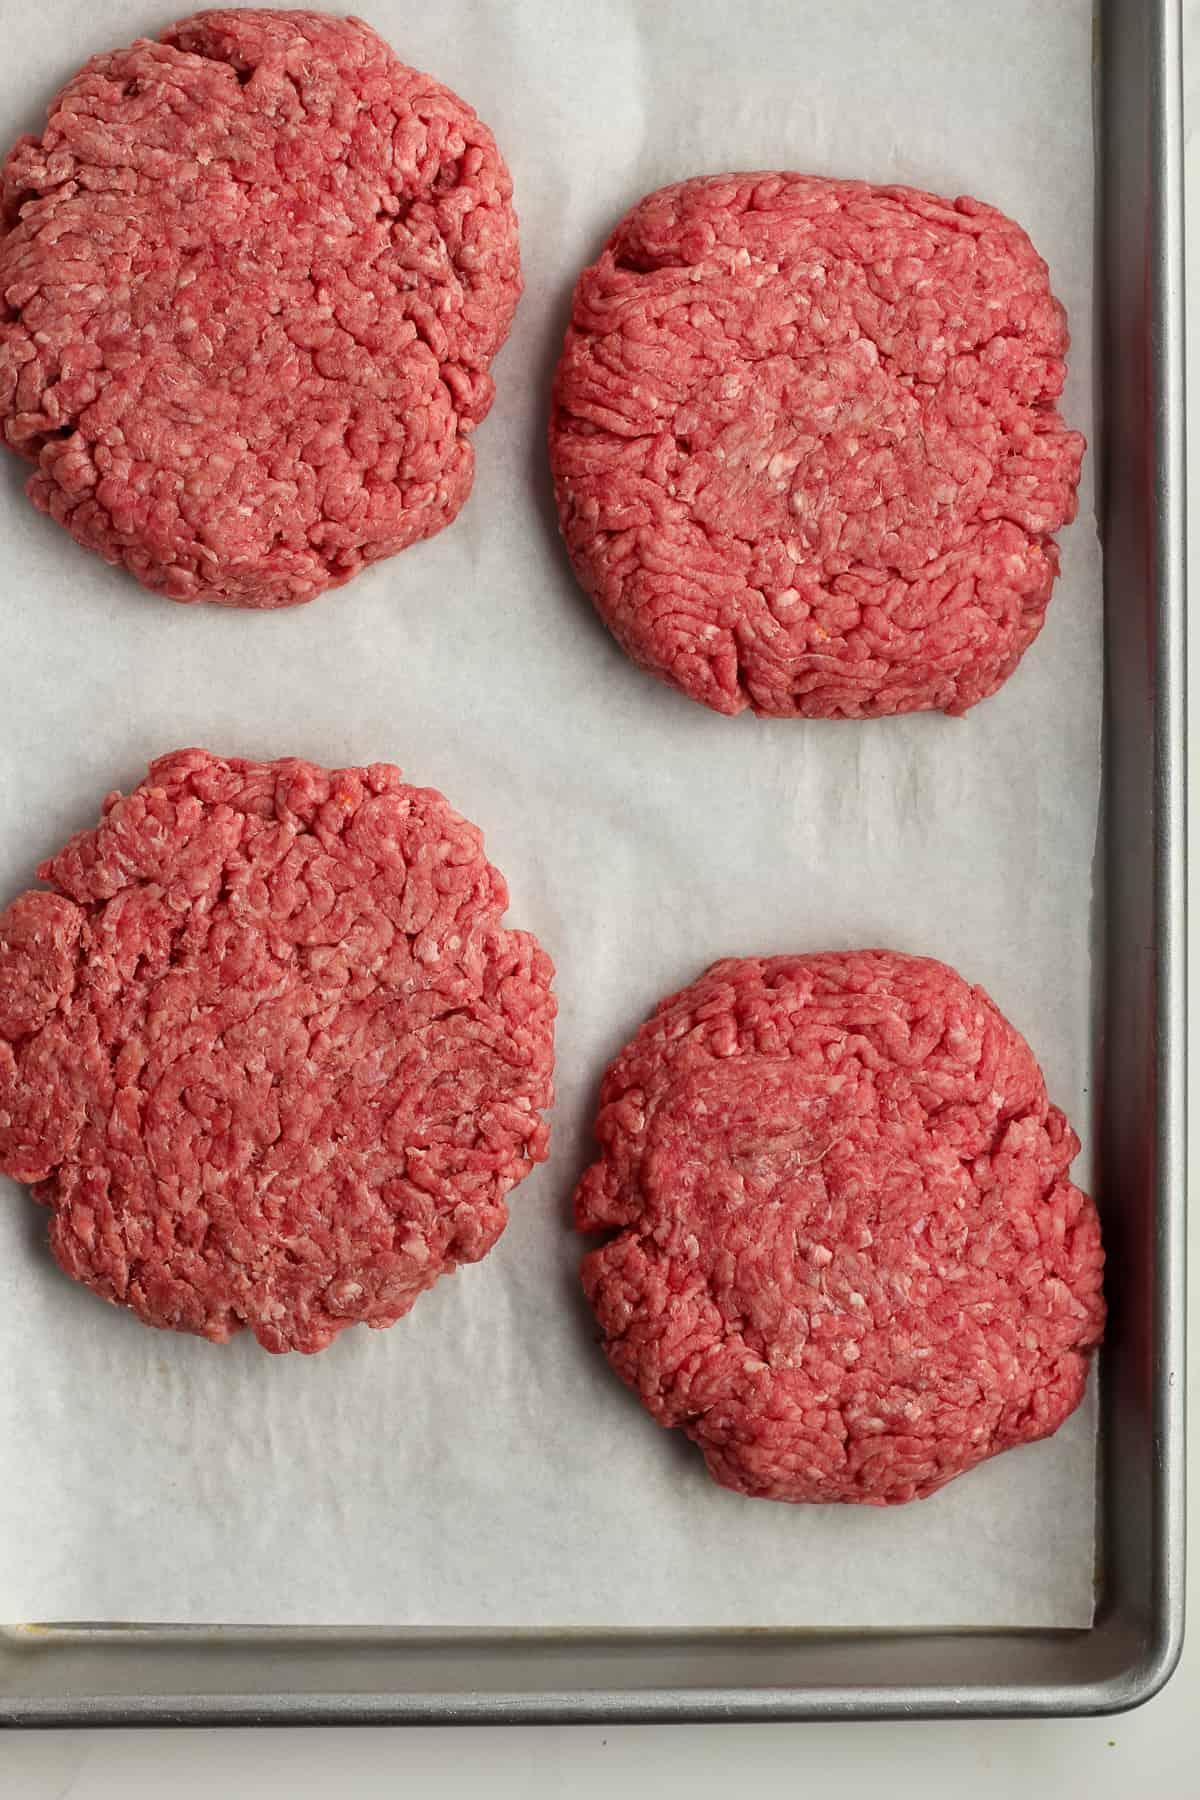 Four ground beef patties.